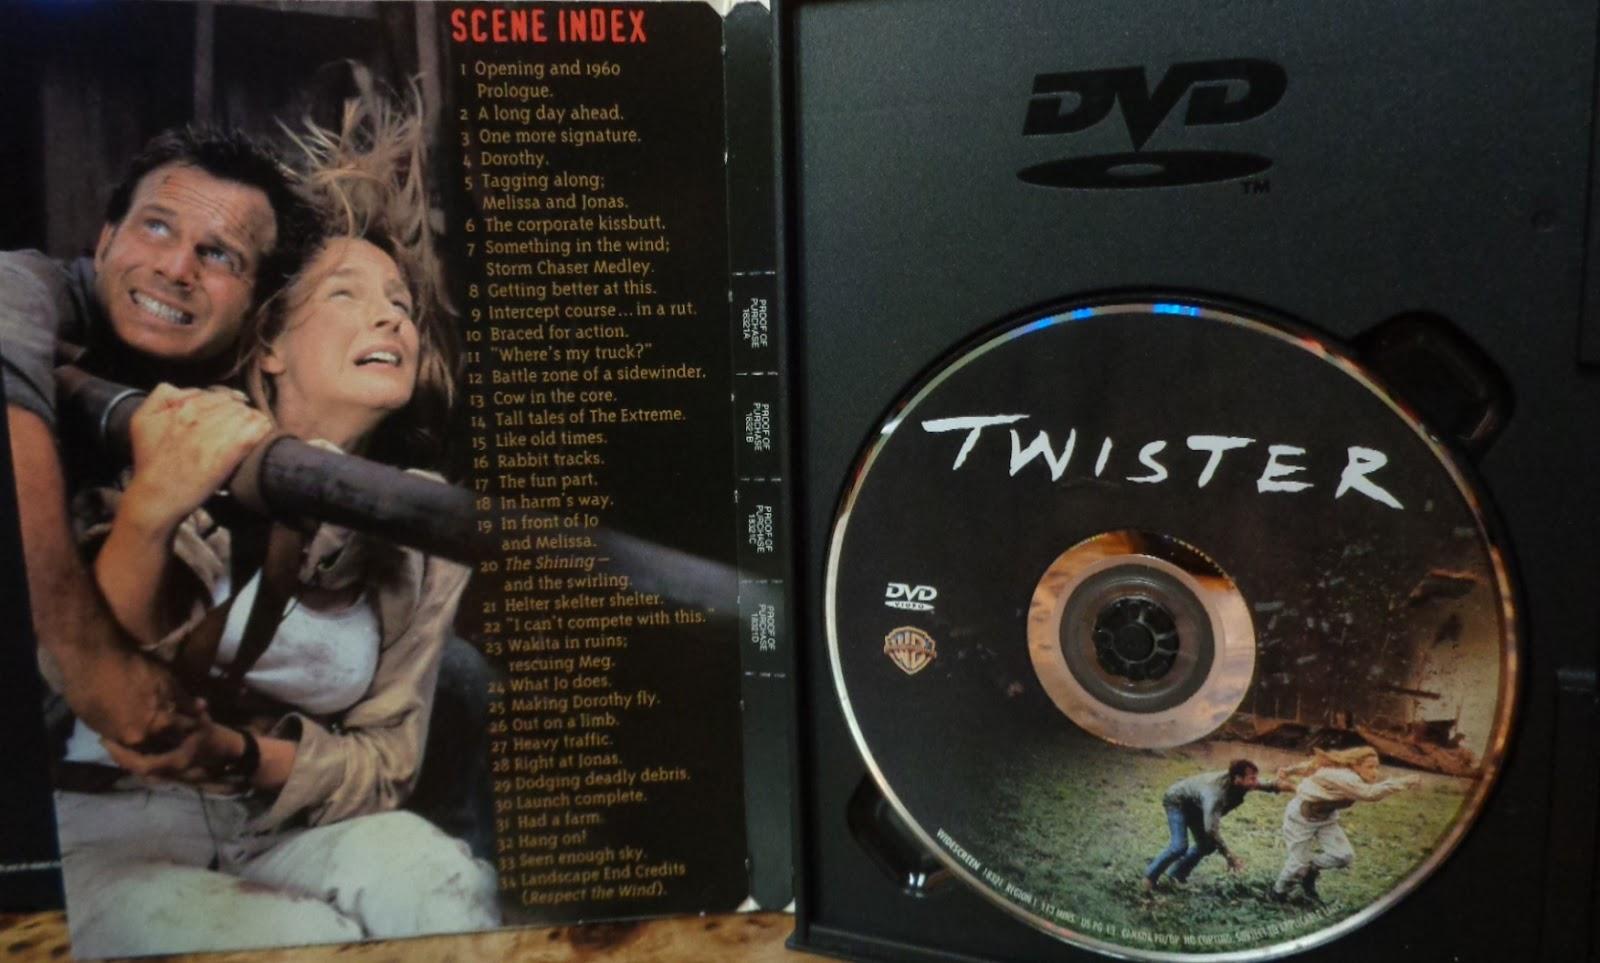 Movies On DVD And Blu-ray: 1996 Movies